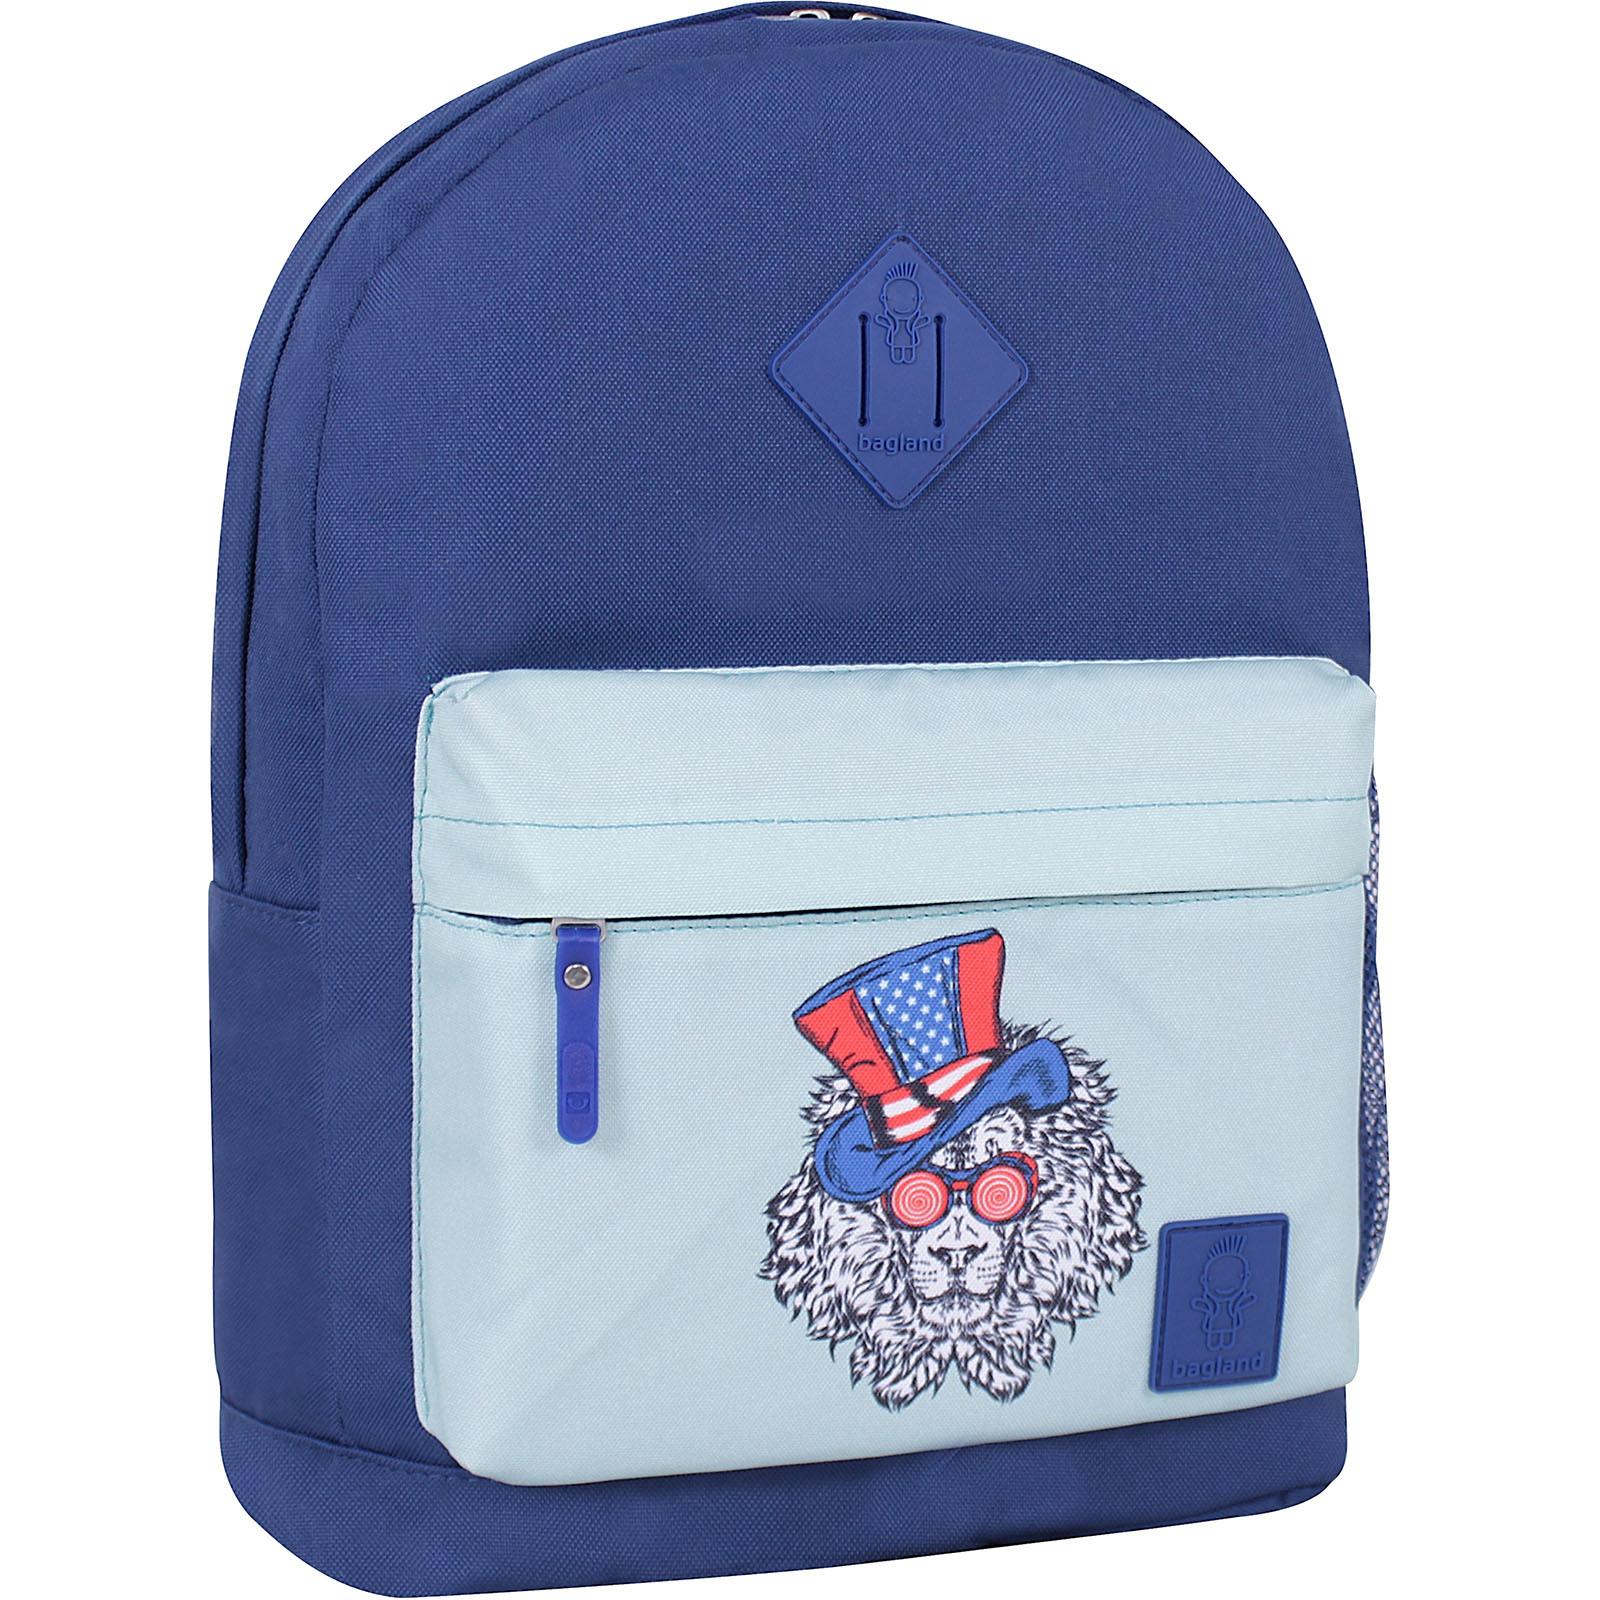 Рюкзак Bagland Молодежный W/R 17 л. Синий 181 (00533662) фото 1